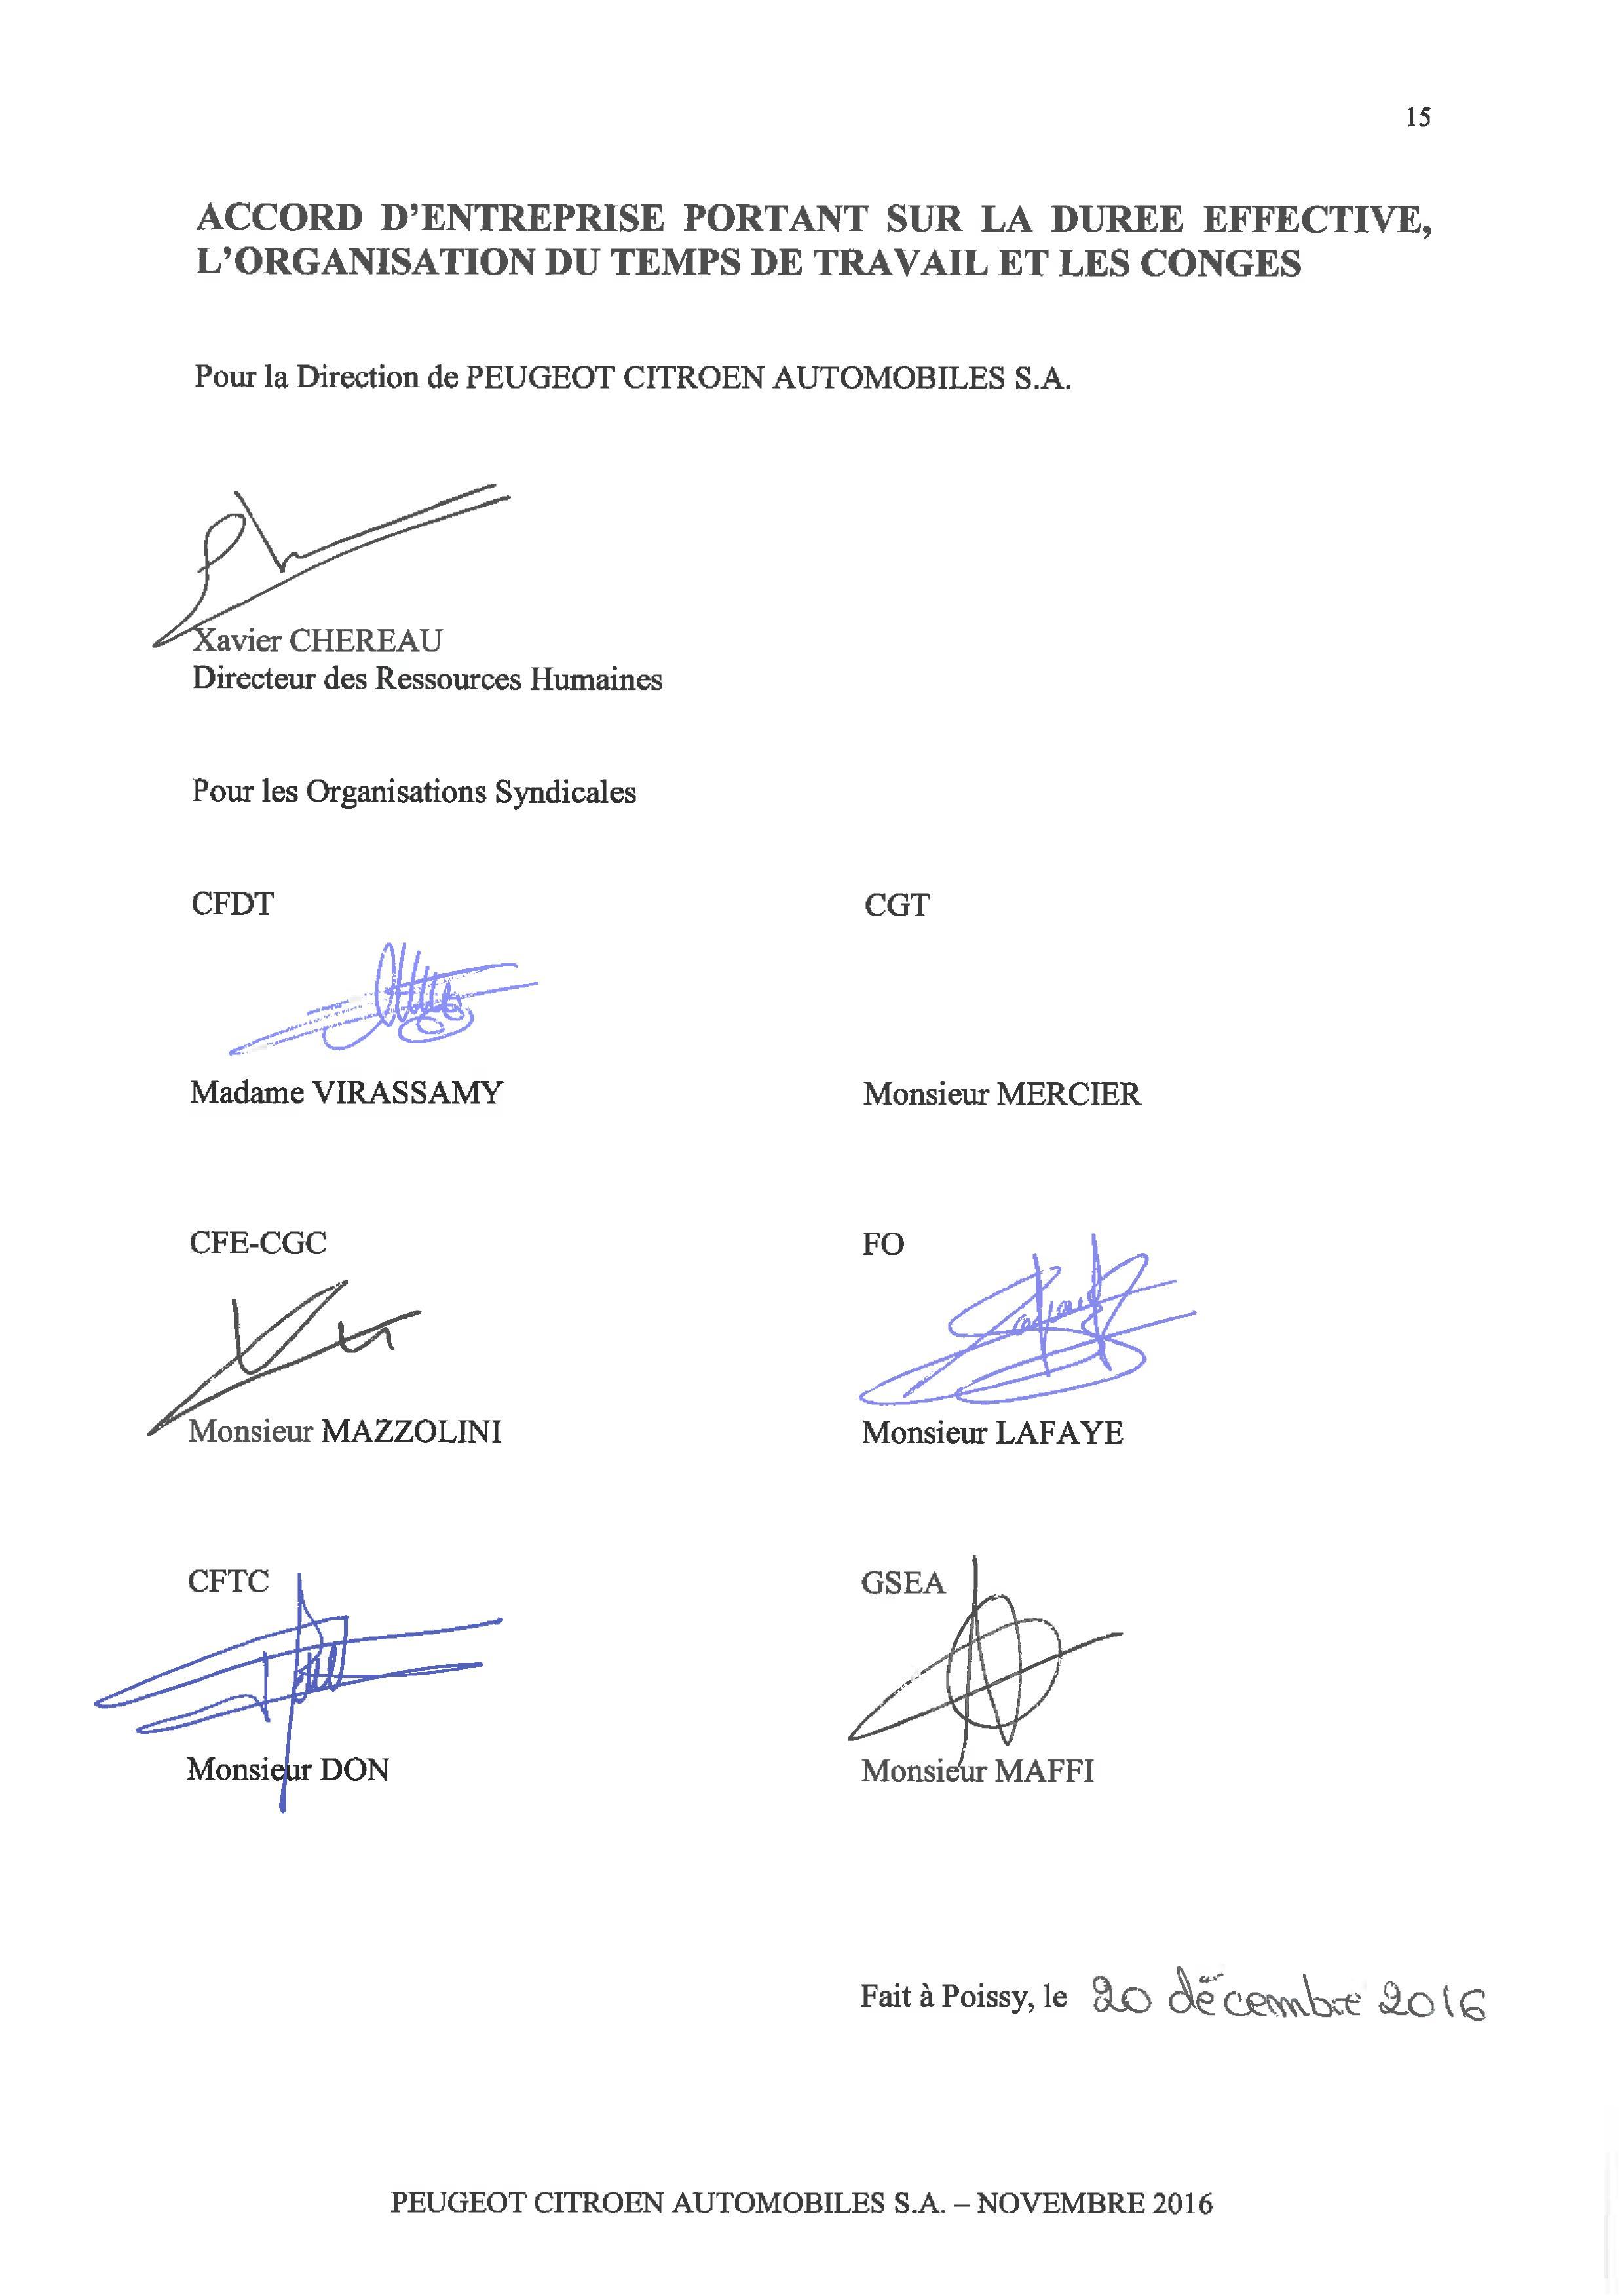 Accord centrale TT Congés_14